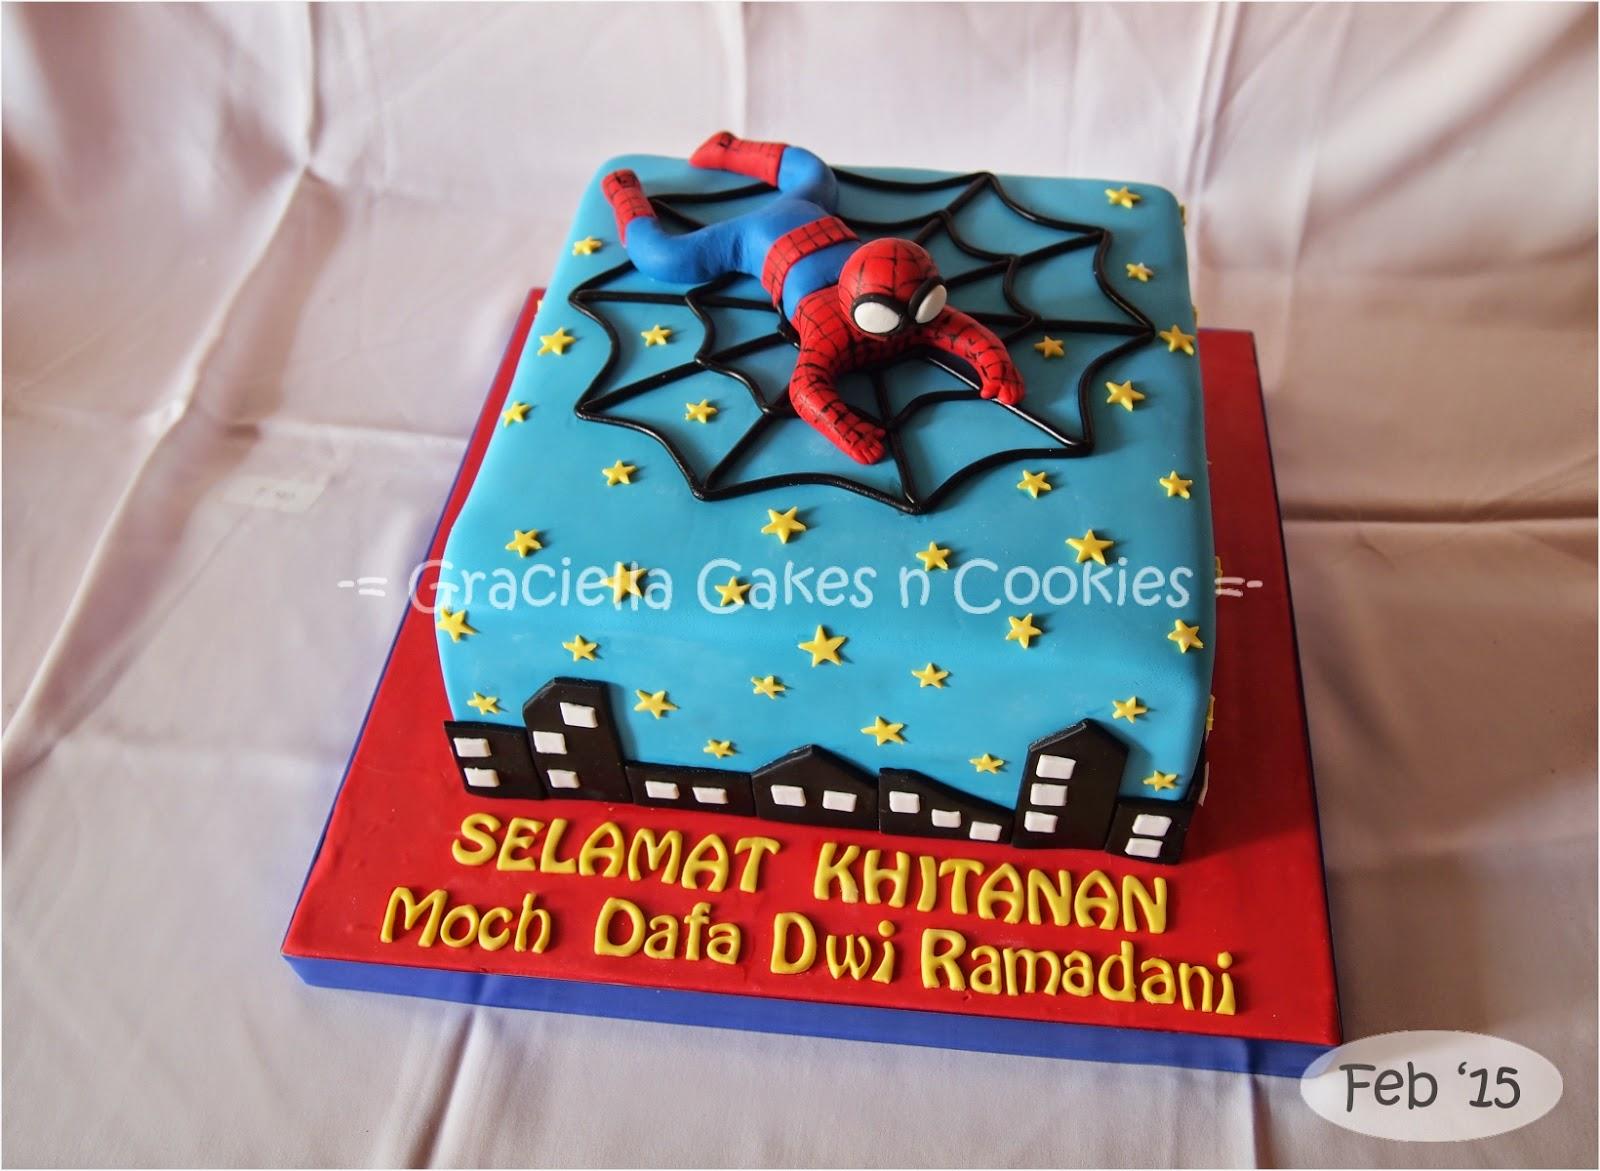 11ae0e1a6 Graciella Cakes Birthday - Manye Cake - Wedding Cupcake & Cake ...